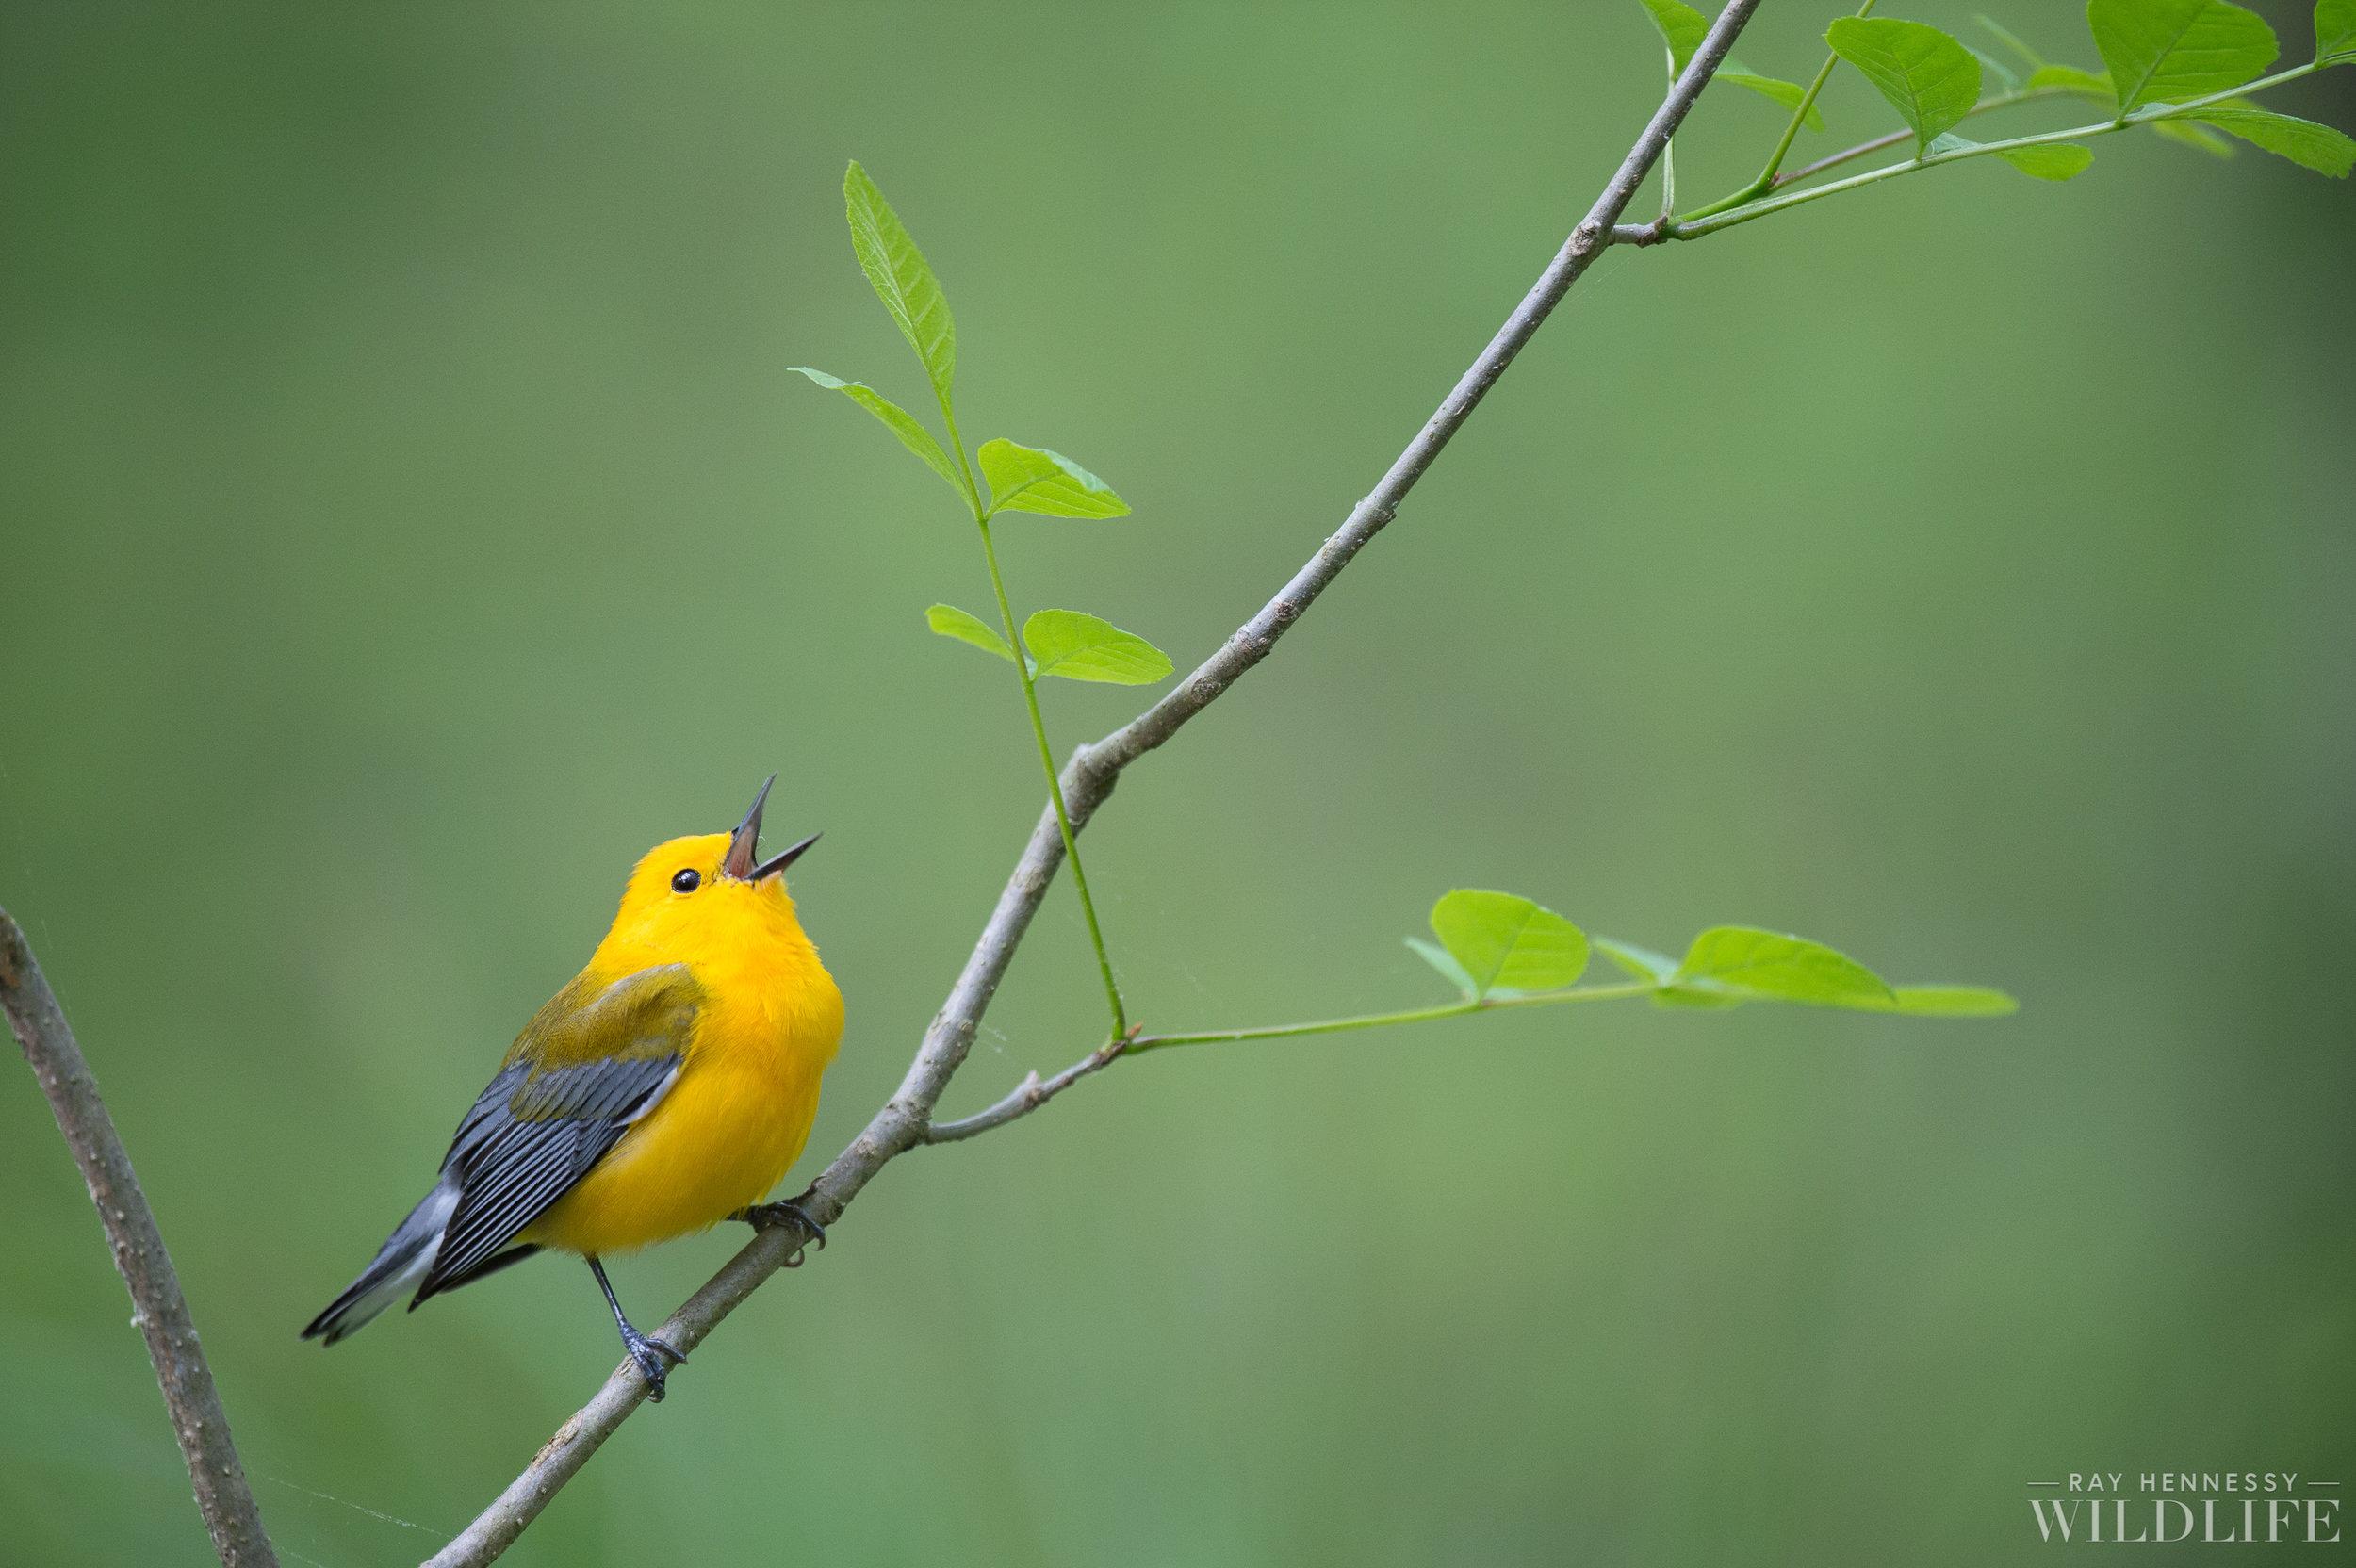 001_Prothonotary Warbler.jpg